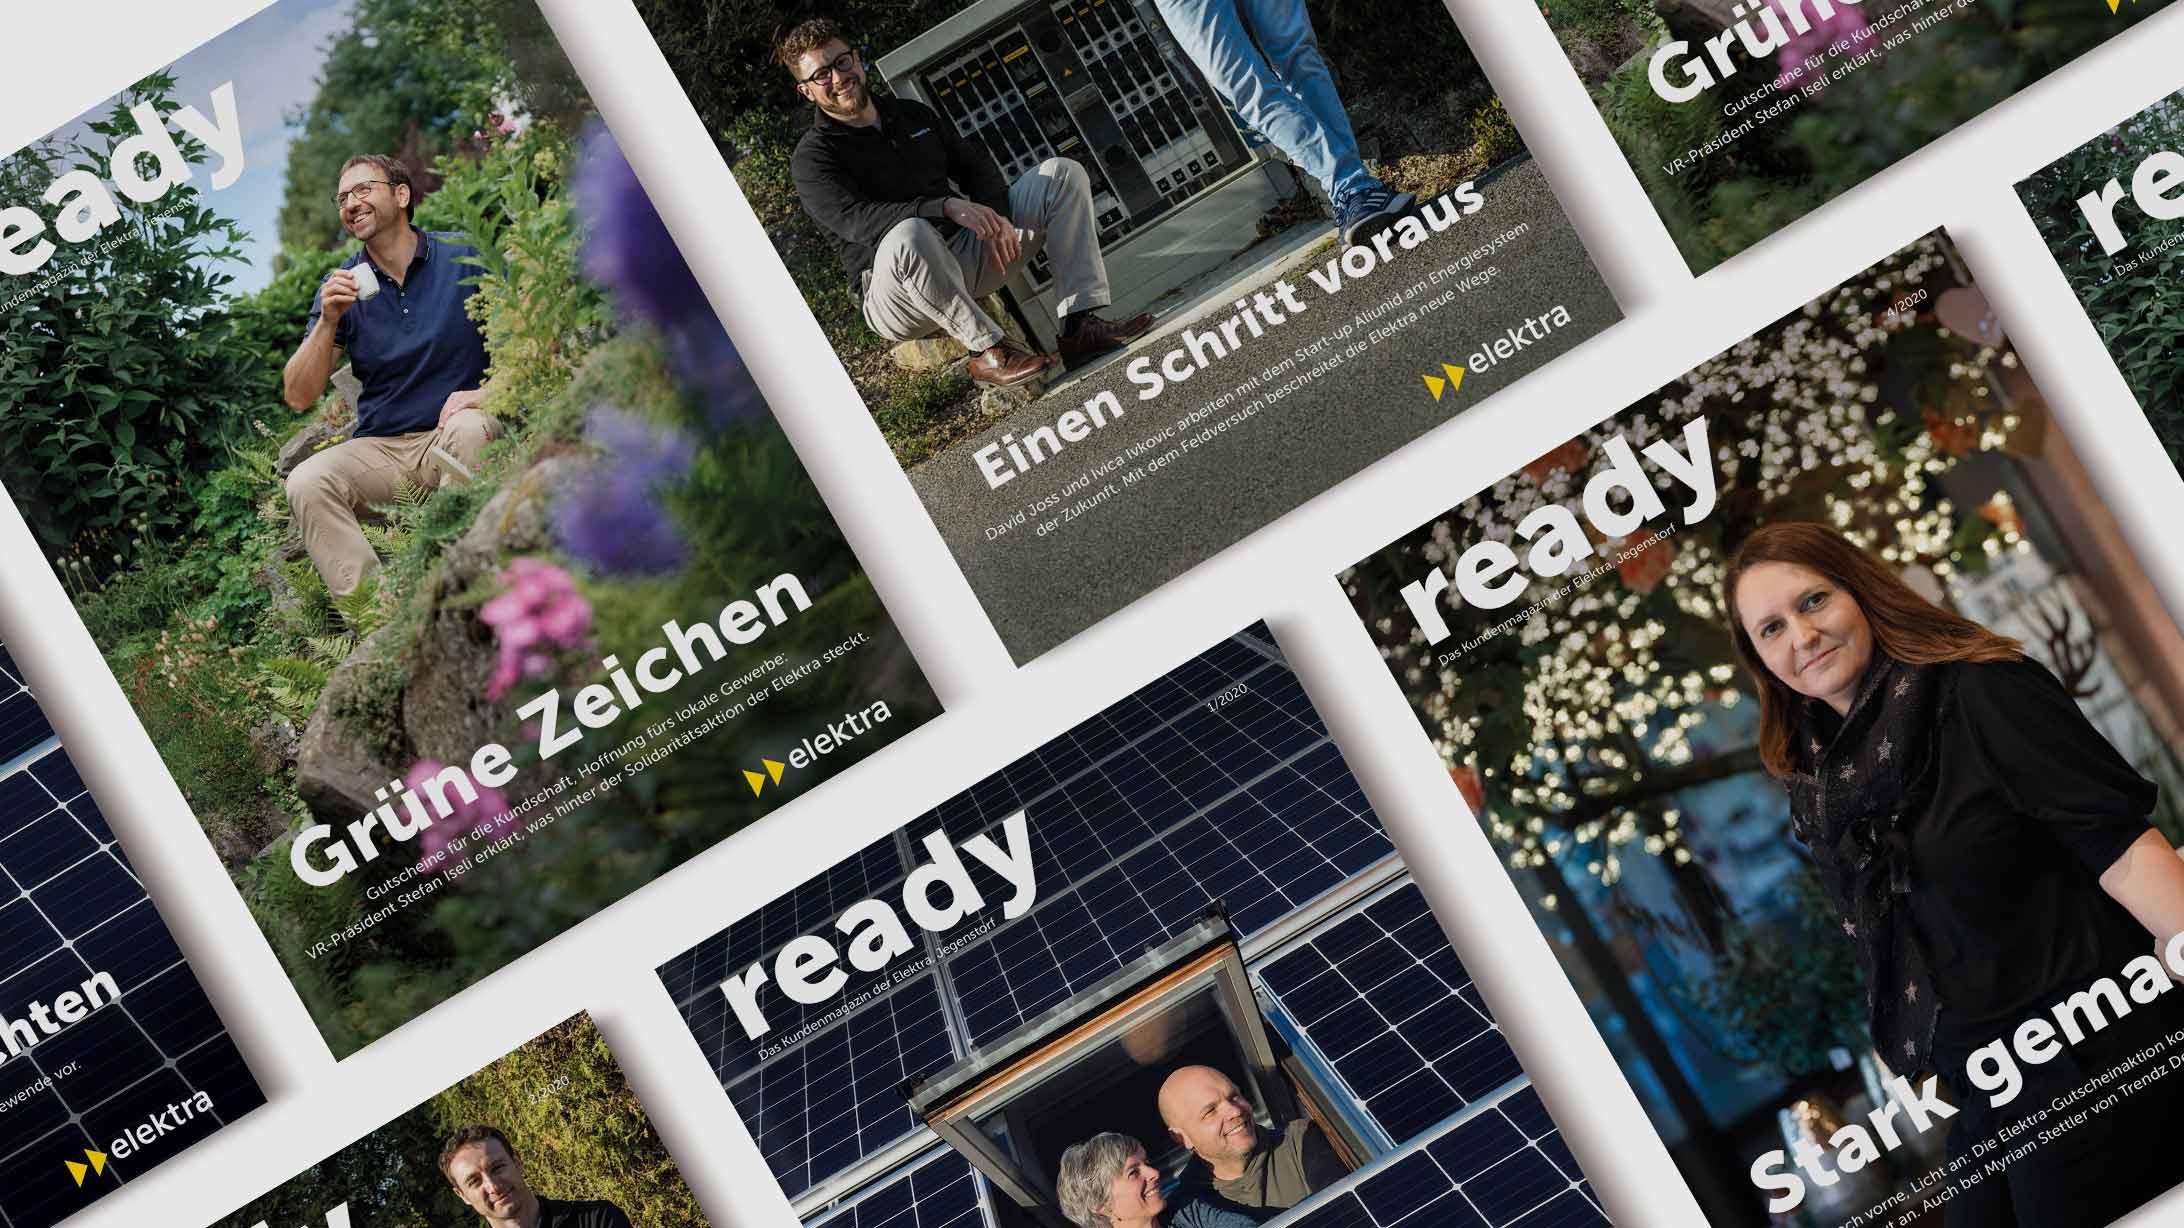 Cover des Elektra Kundenmagazins ready.